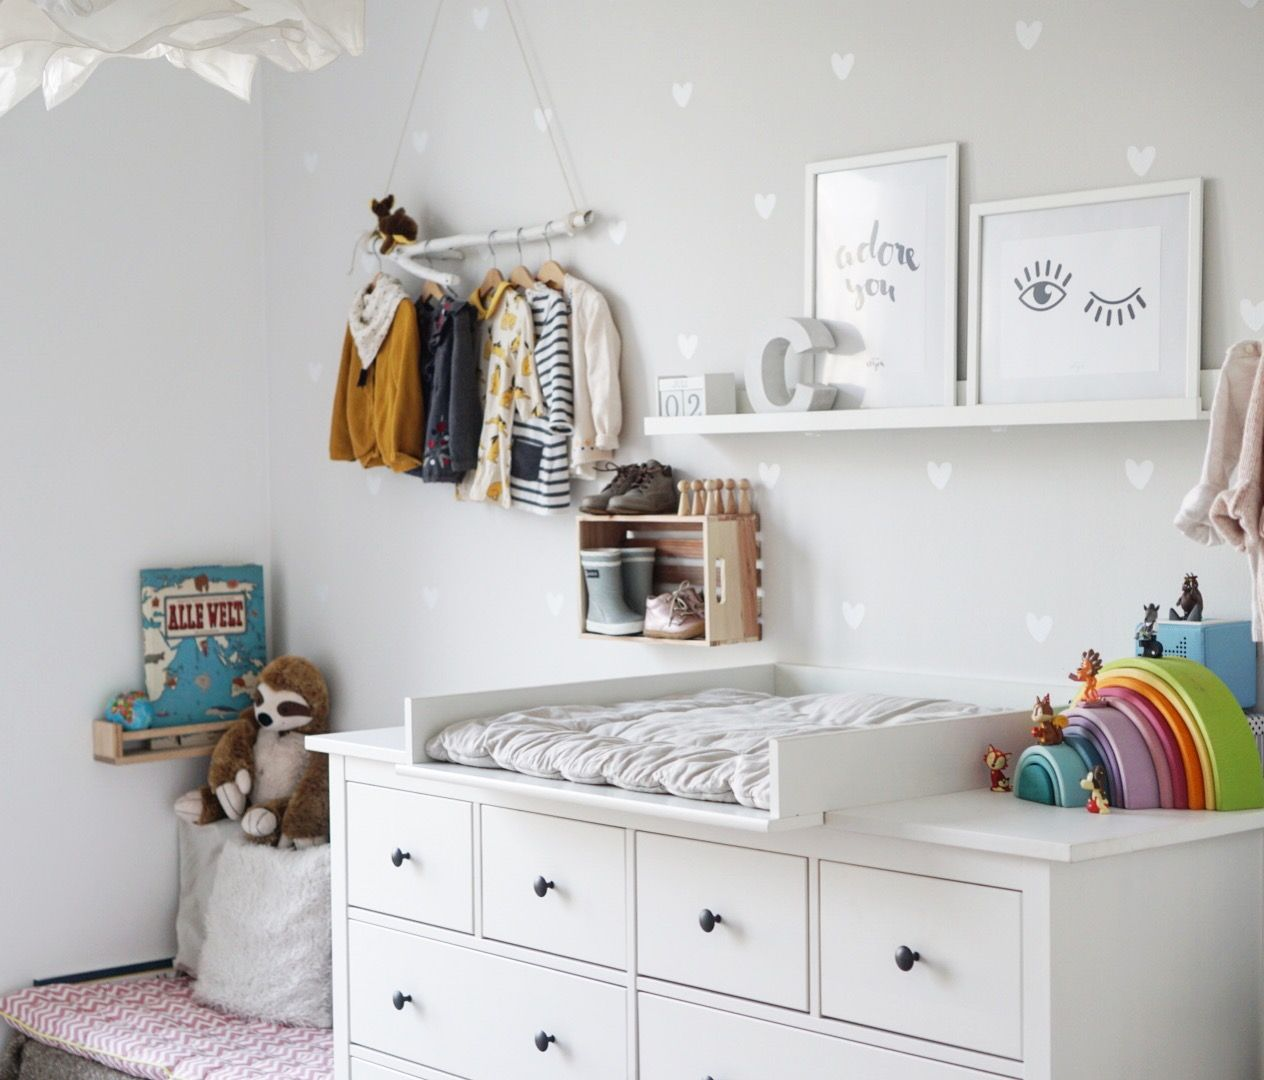 Kinderzimmer Kinderzimmerdeko Madchenzimmer Hemnes Ikea Ikeahack